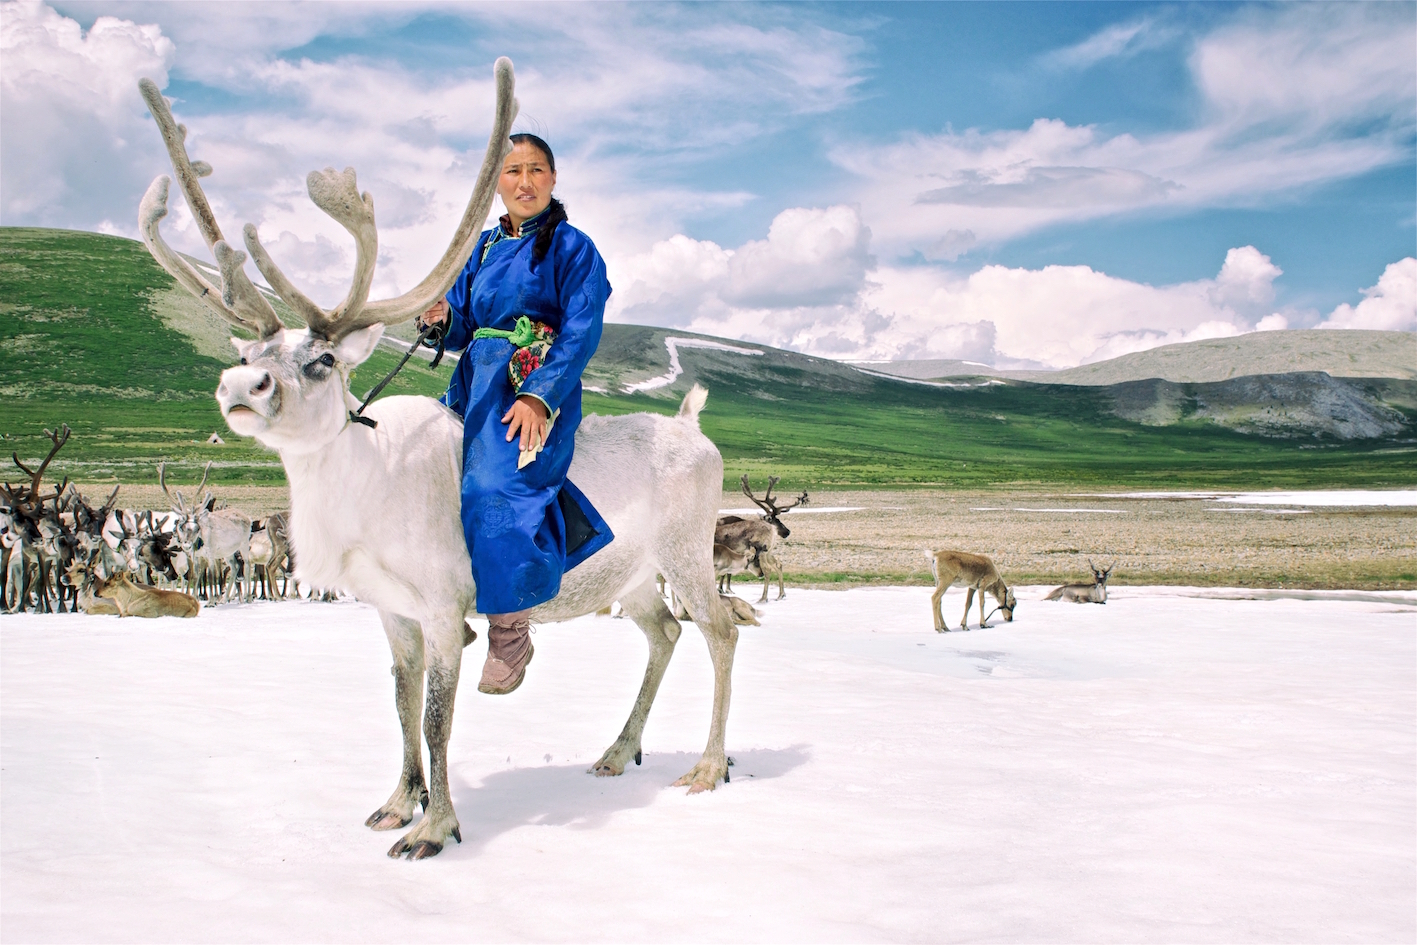 Khasar_S_BaigalPortraitOnReindeer_UlaanTaiga_Huvsgul_Mongolia_Summer_2013 3.jpg